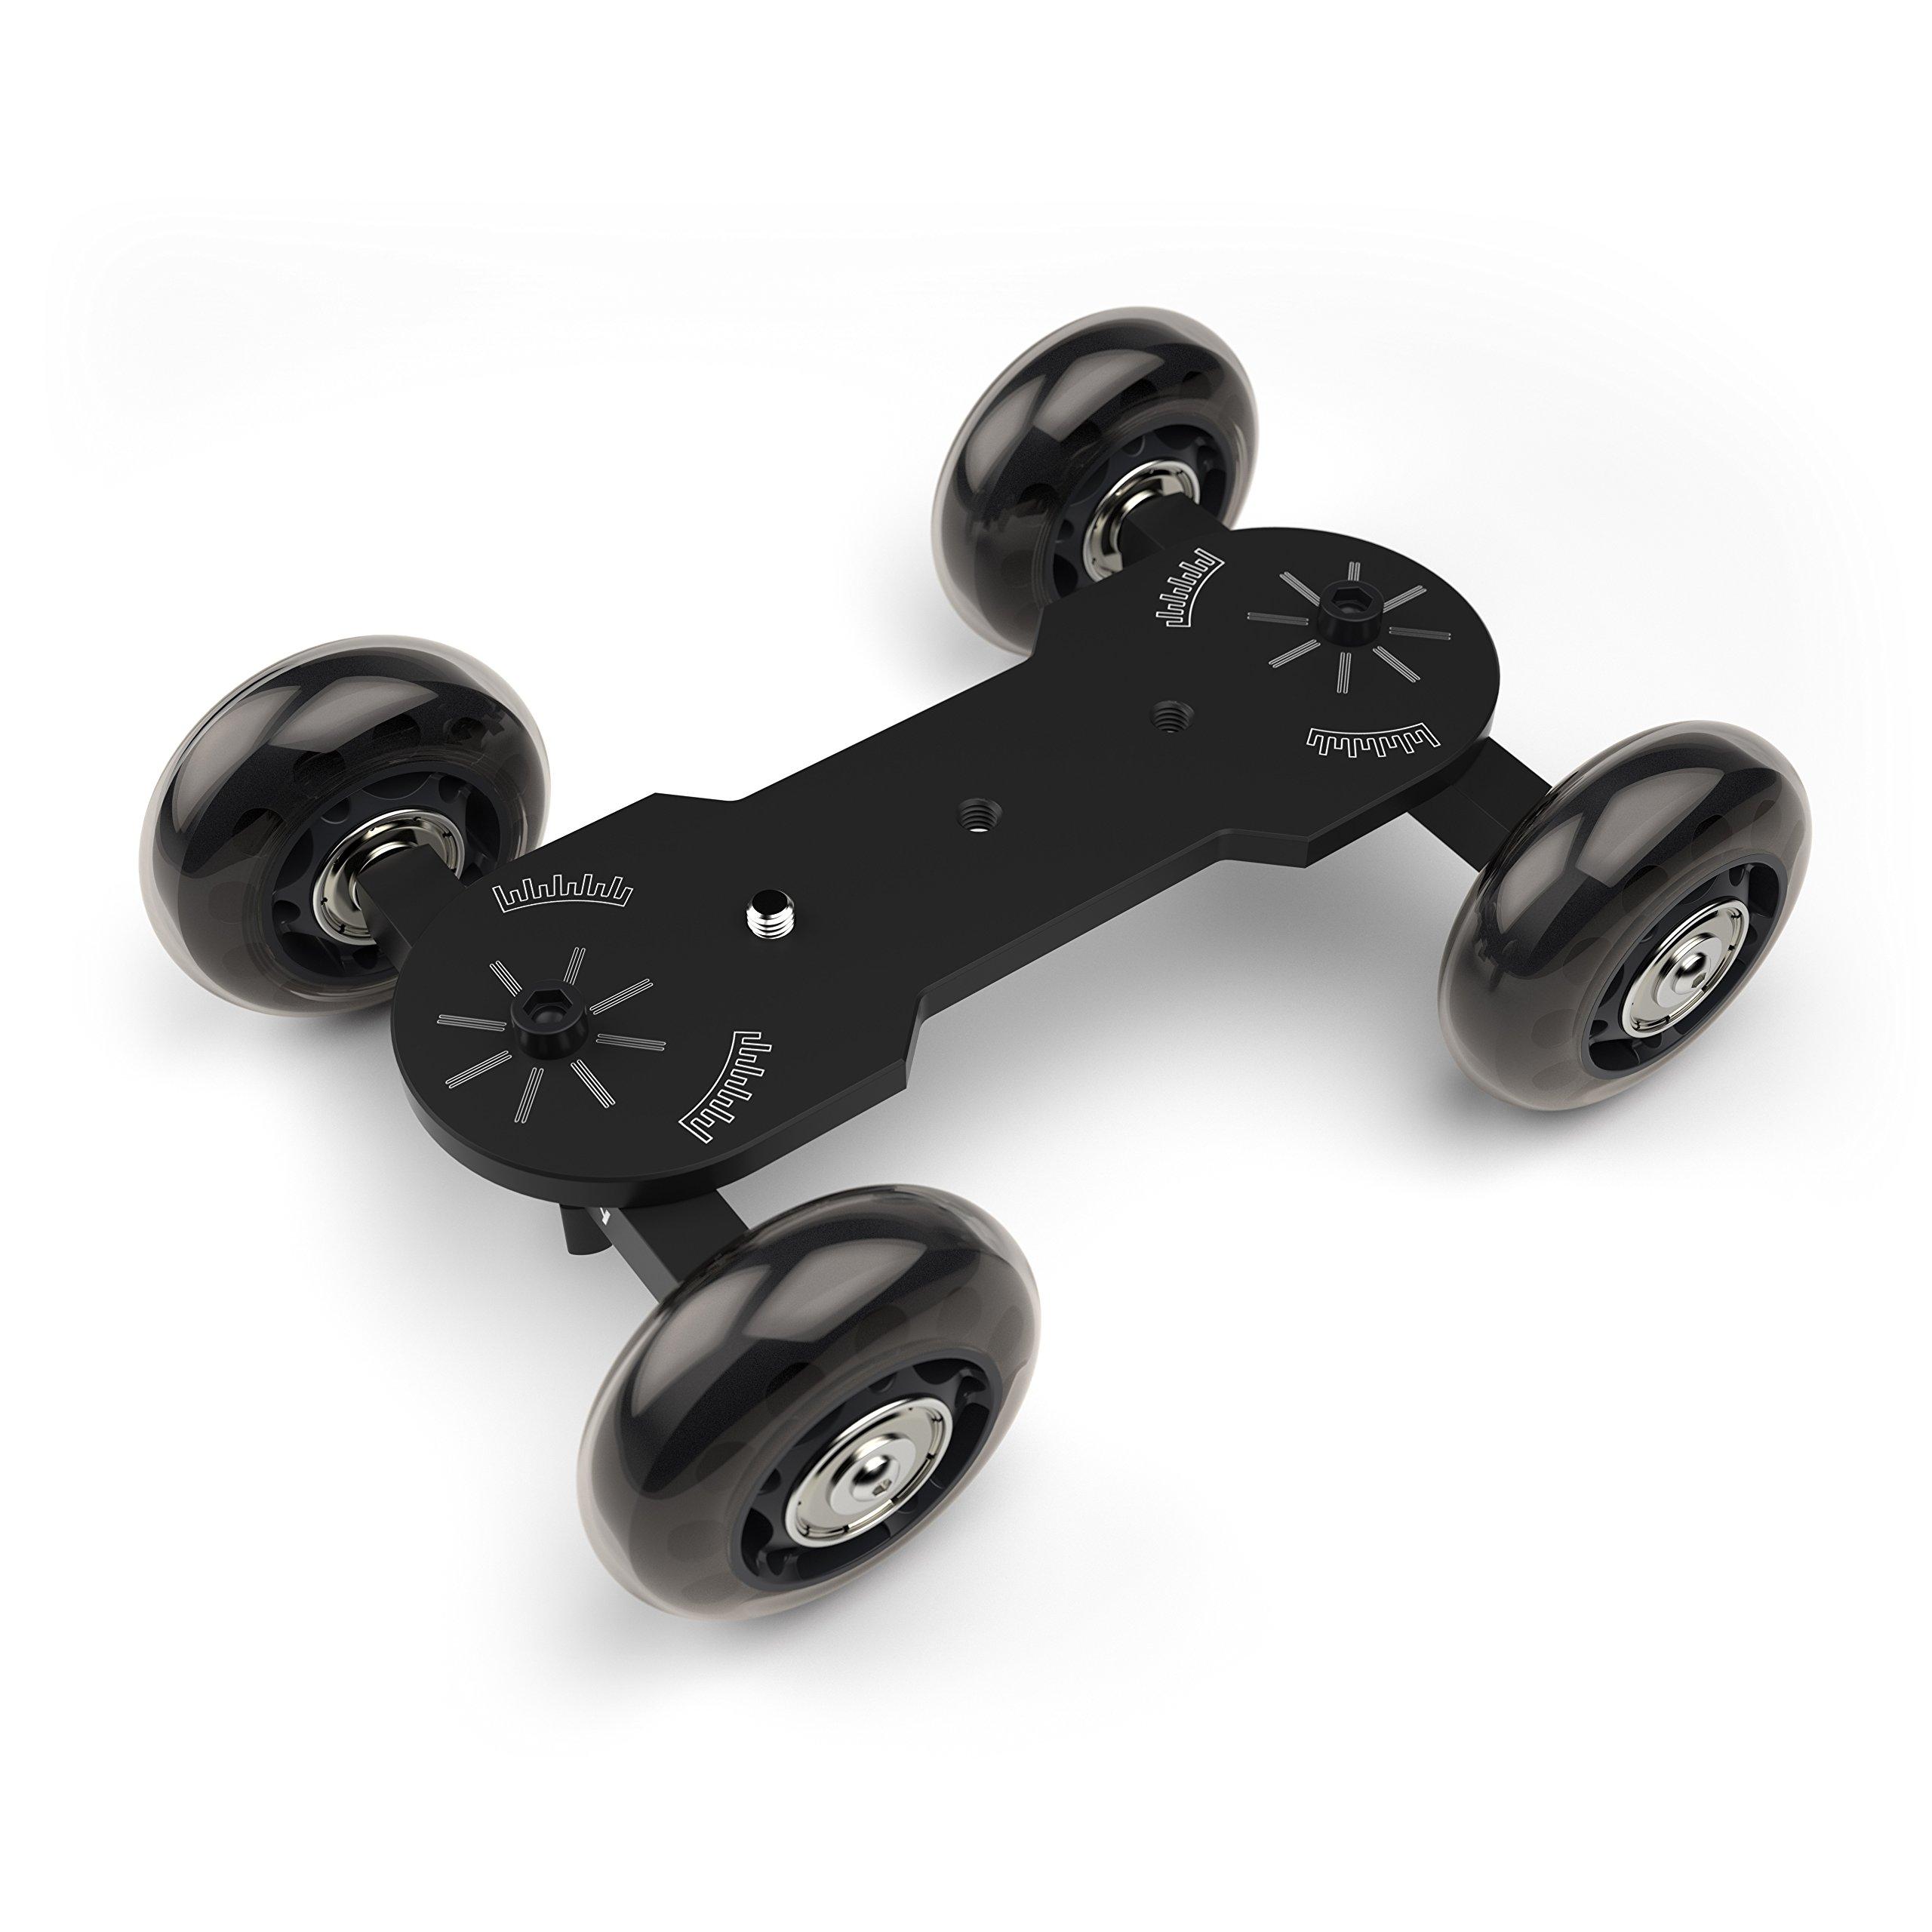 Luminously Camera Skate Dolly DSLR Rail Car Slider - Smooth Table Top Skater For Cameras (Black)